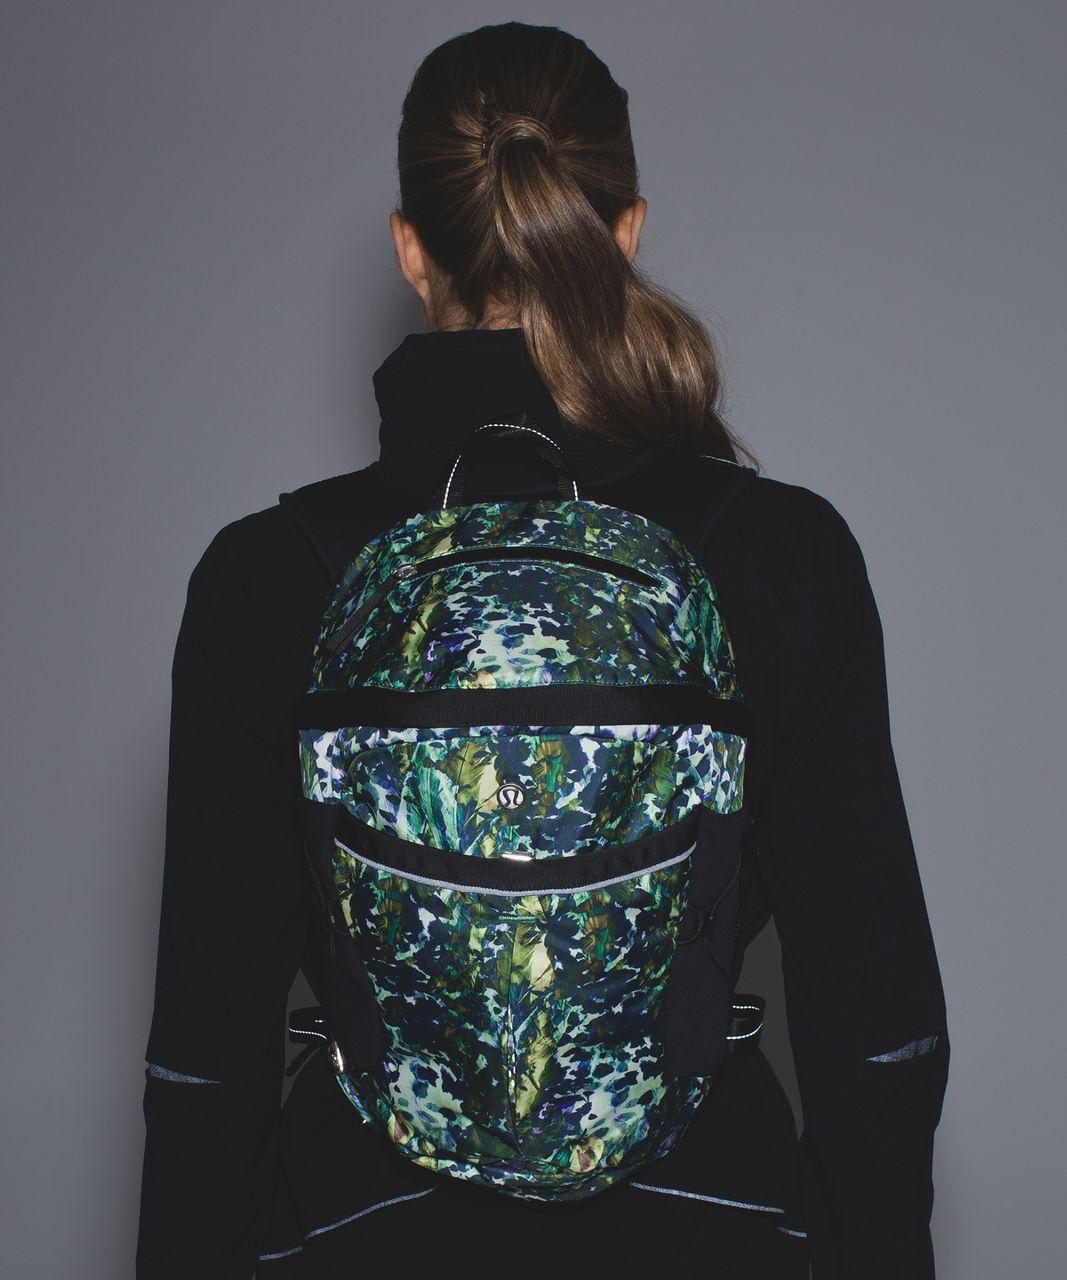 Lululemon Run All Day Backpack - Floral Backdrop White Multi / Black